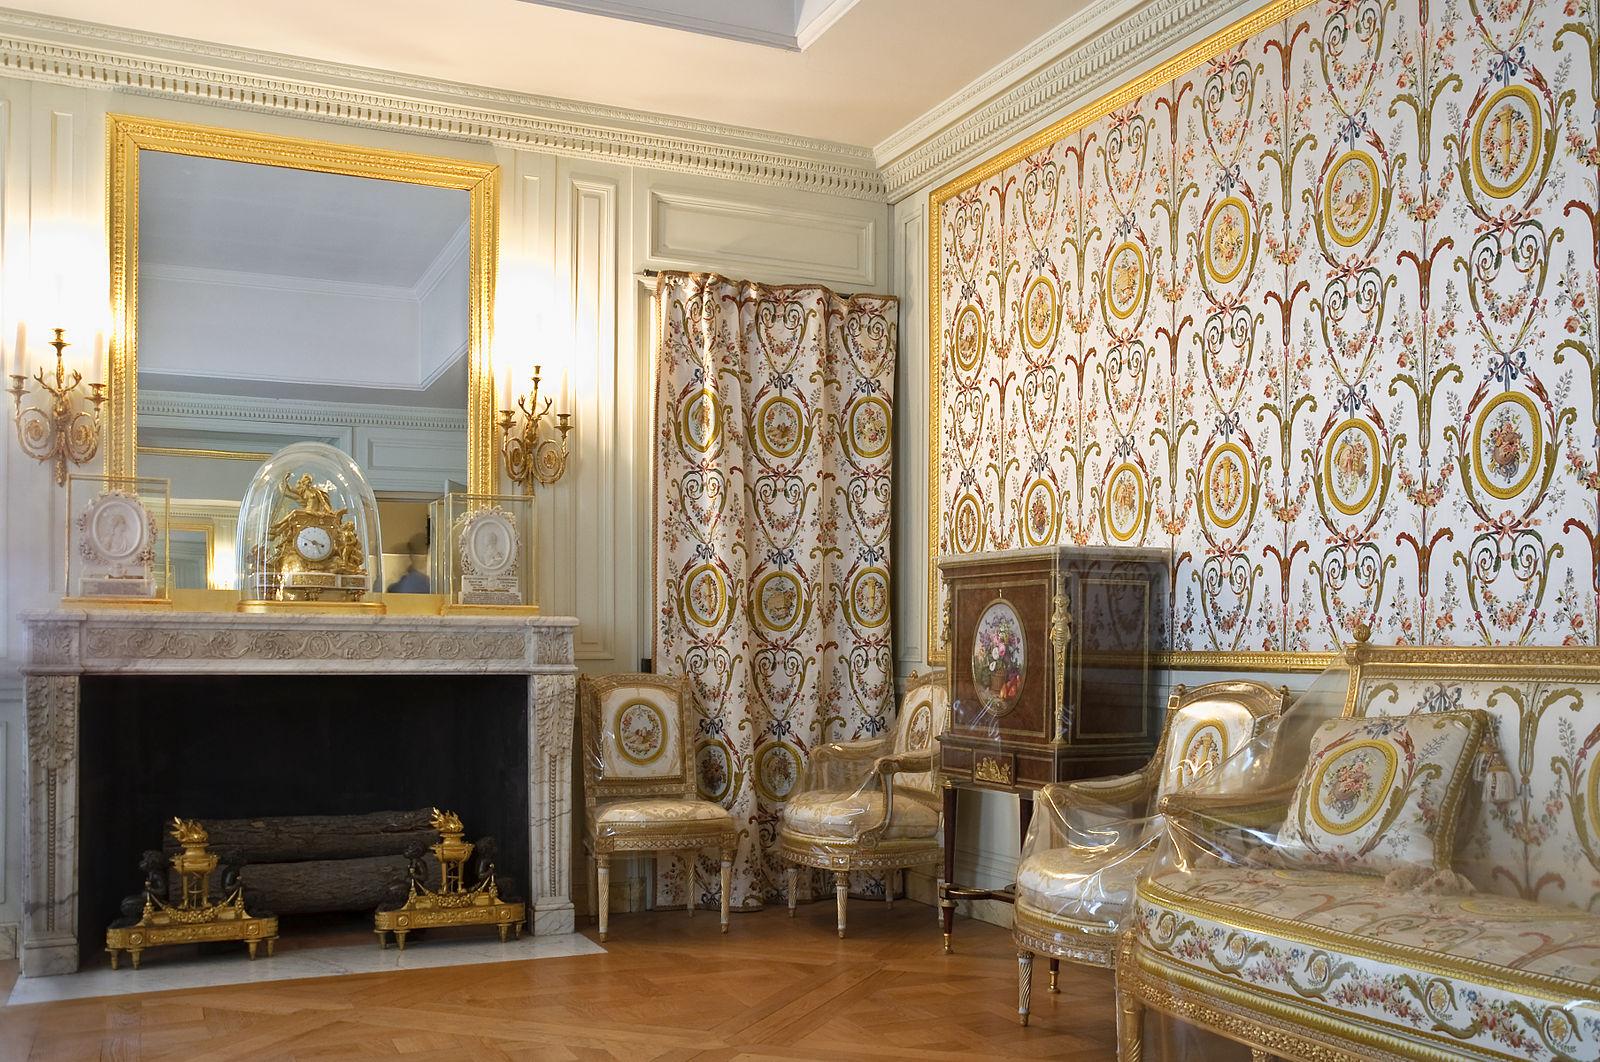 https://upload.wikimedia.org/wikipedia/commons/thumb/c/c3/Chateau_Versailles_cabinets_interieurs_de_la_Reine_cabinet_du_Billard.jpg/1600px-Chateau_Versailles_cabinets_interieurs_de_la_Reine_cabinet_du_Billard.jpg